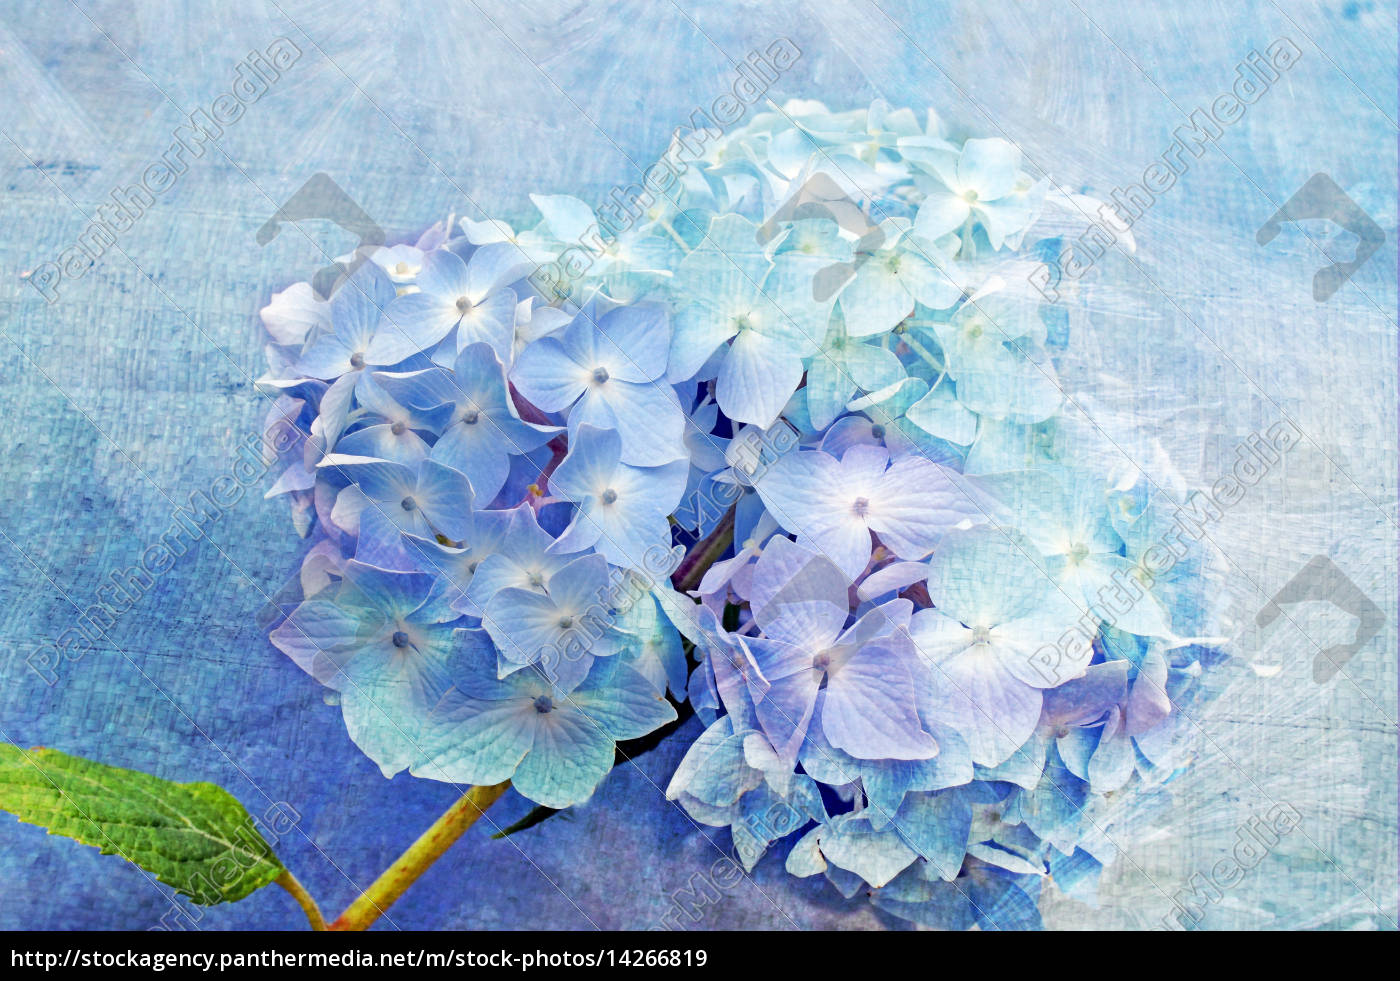 Blaue Hortensie Lizenzfreies Bild 14266819 Bildagentur